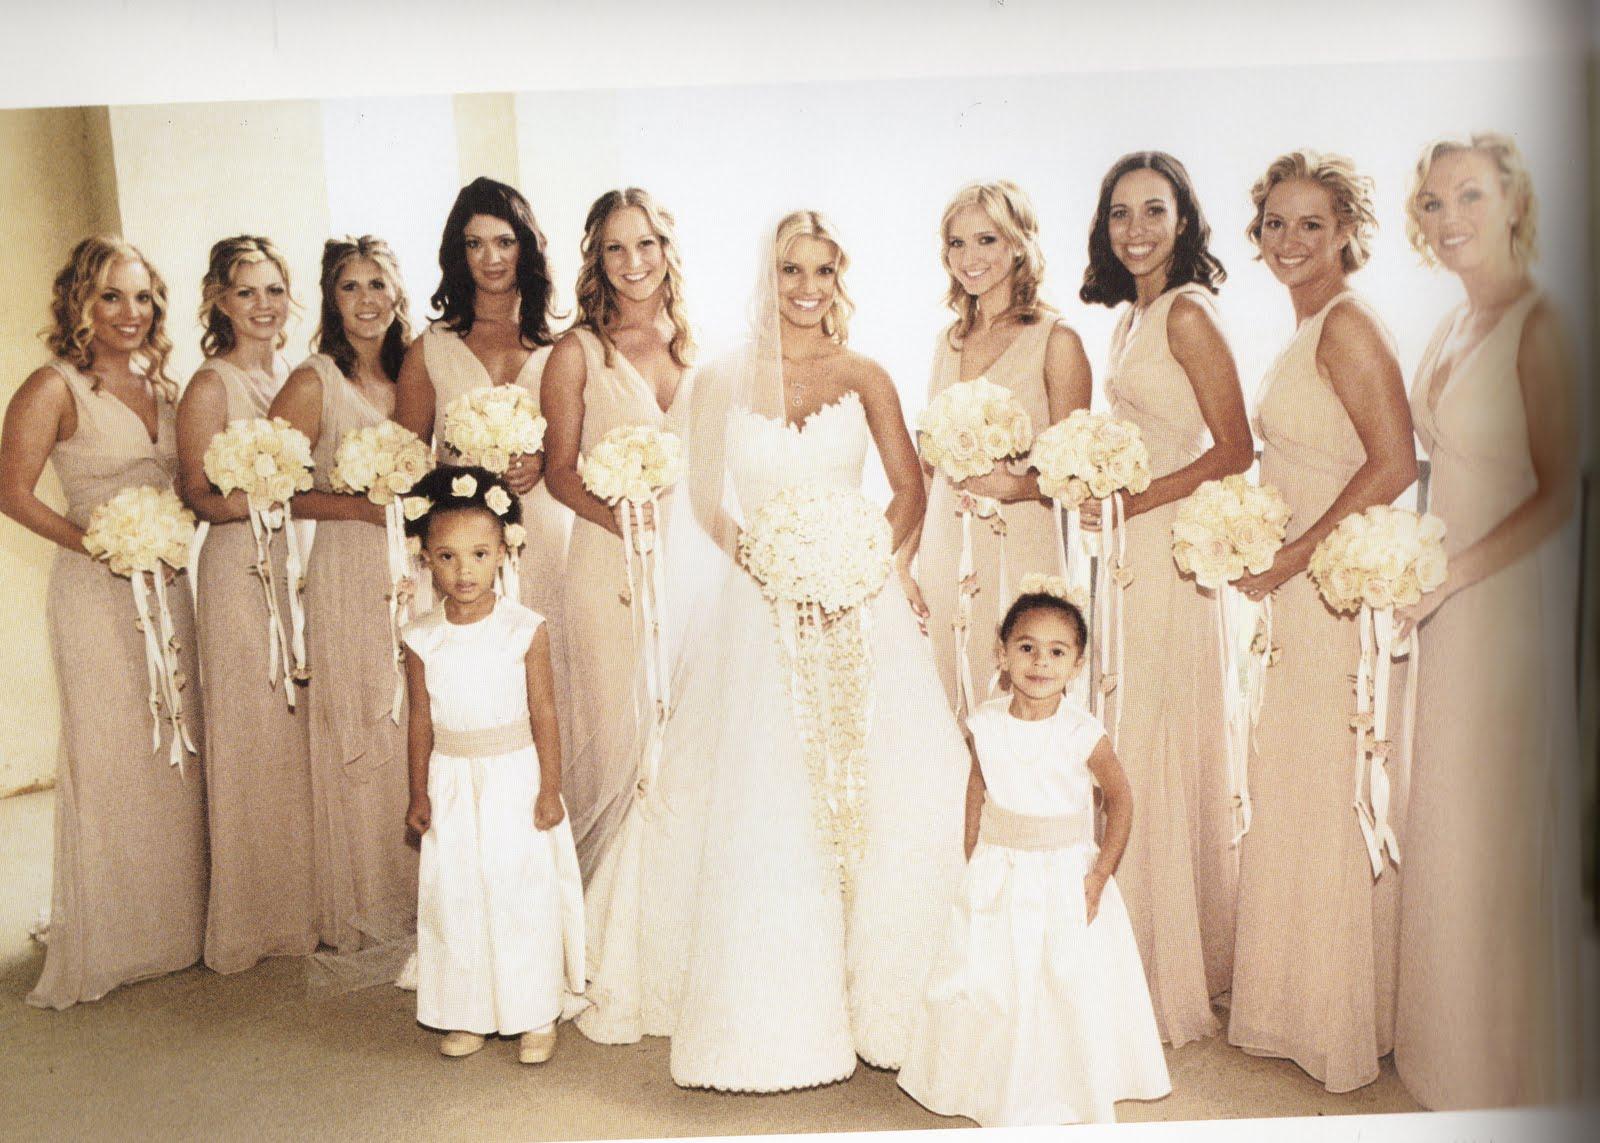 jessica simpson wedding Wedding Pictures